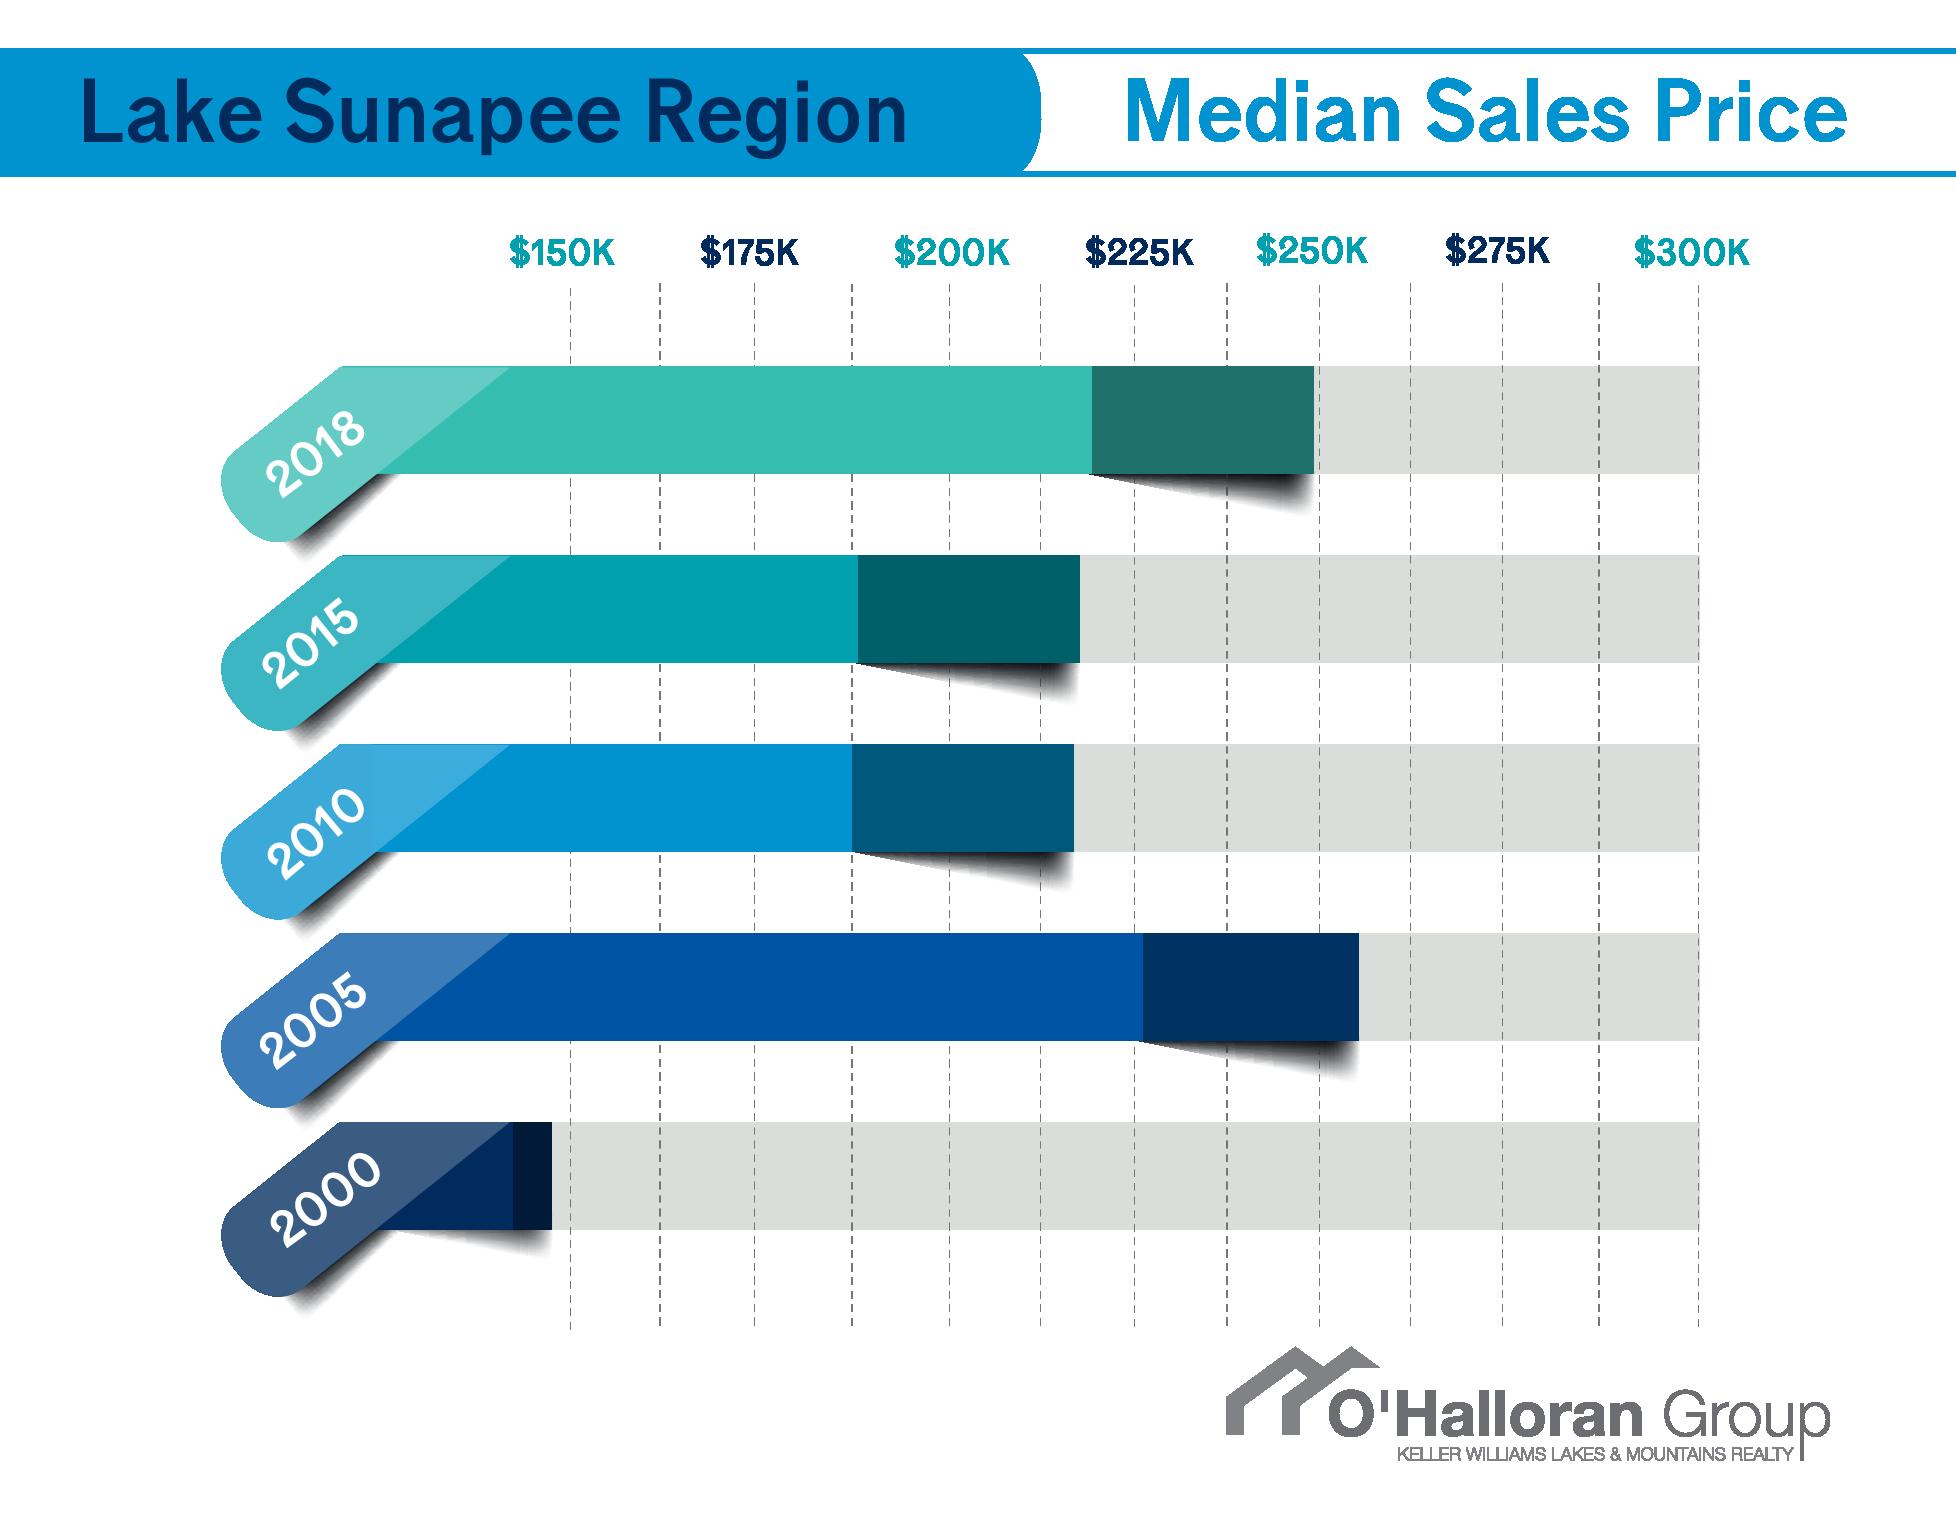 Median Home Sales Price Lake Sunapee Region